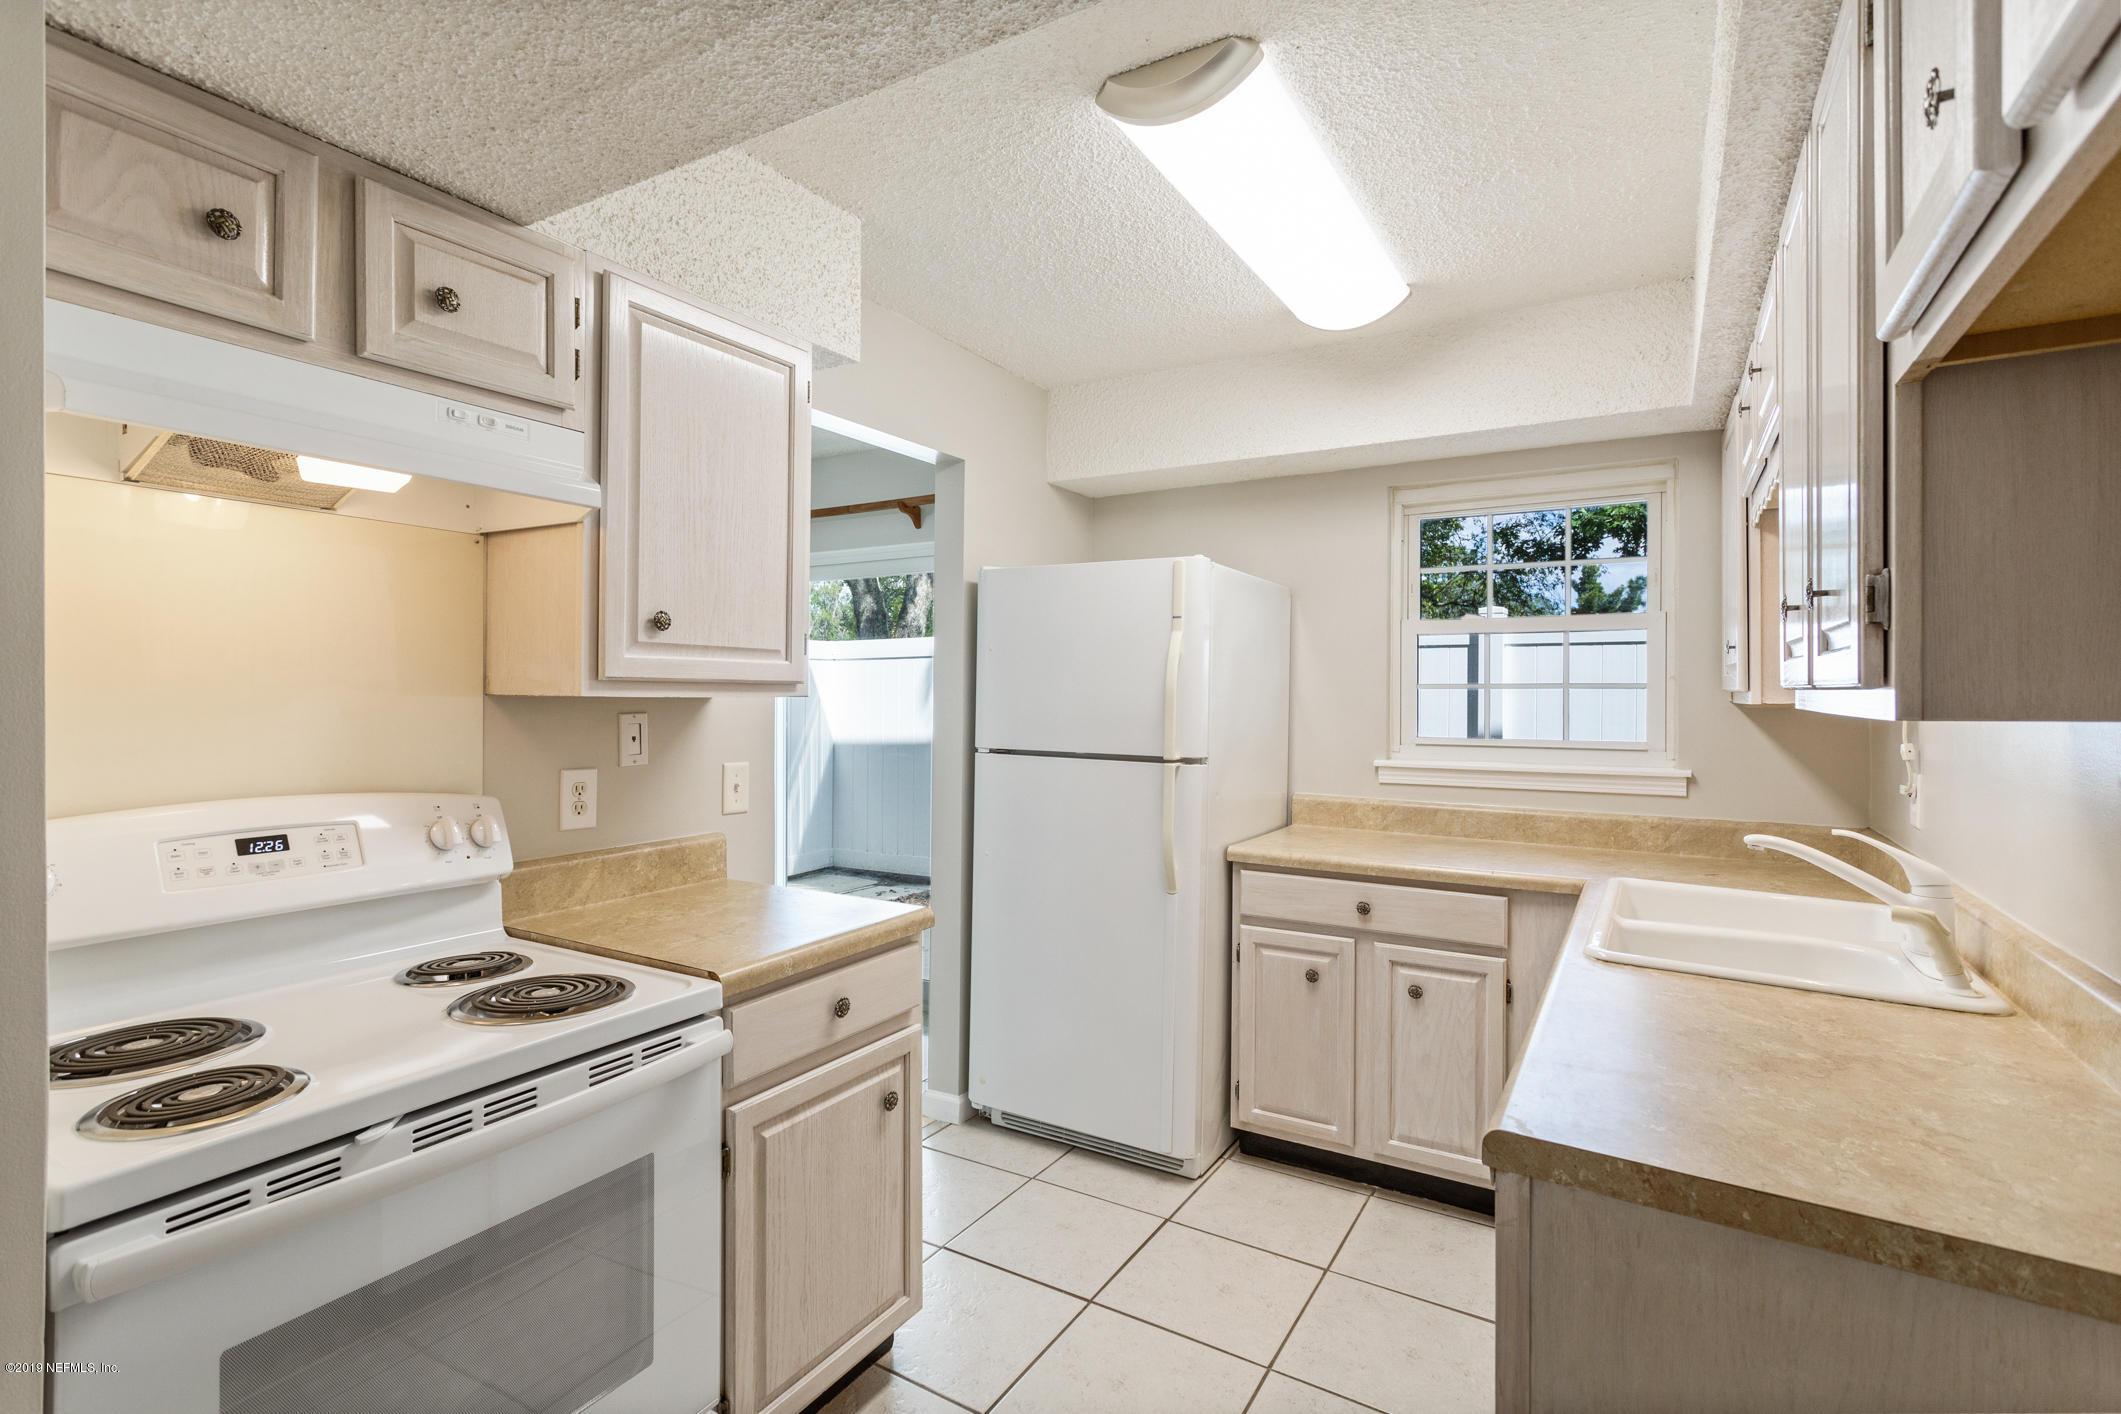 303 KETTERING, ORANGE PARK, FLORIDA 32073, 2 Bedrooms Bedrooms, ,1 BathroomBathrooms,Condo,For sale,KETTERING,1019468